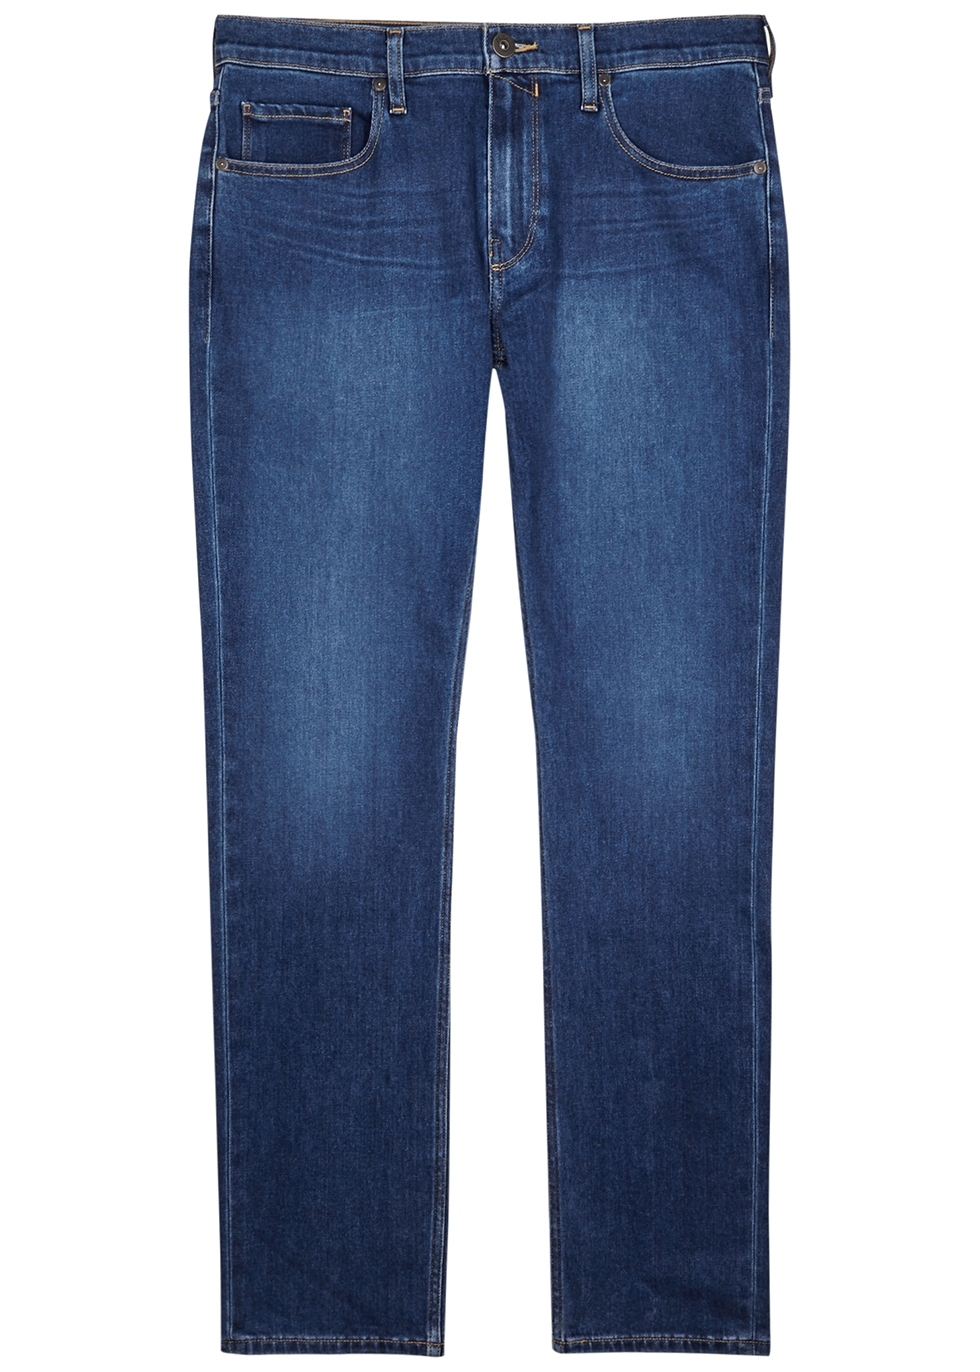 Federal blue straight-leg jeans